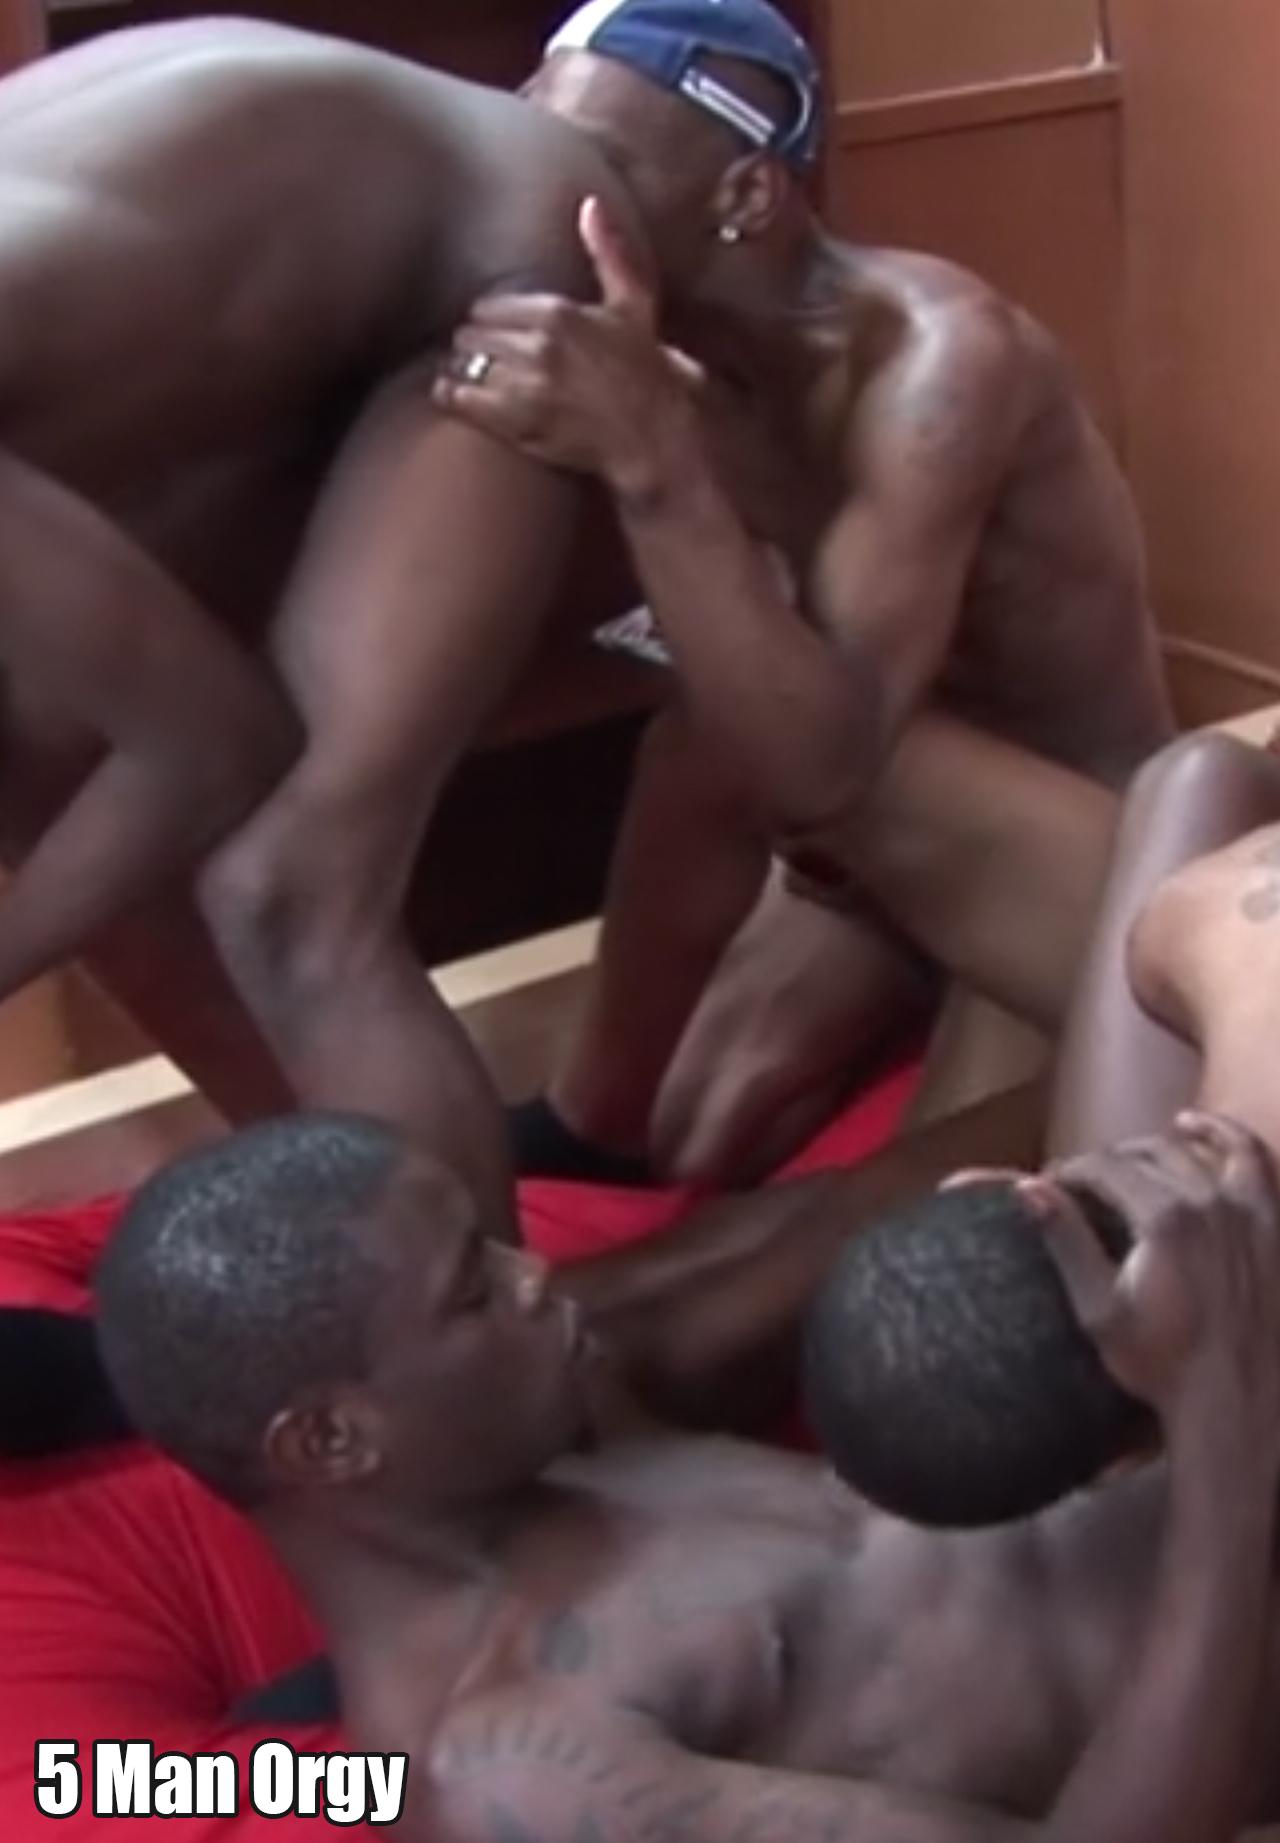 Five Man Orgy